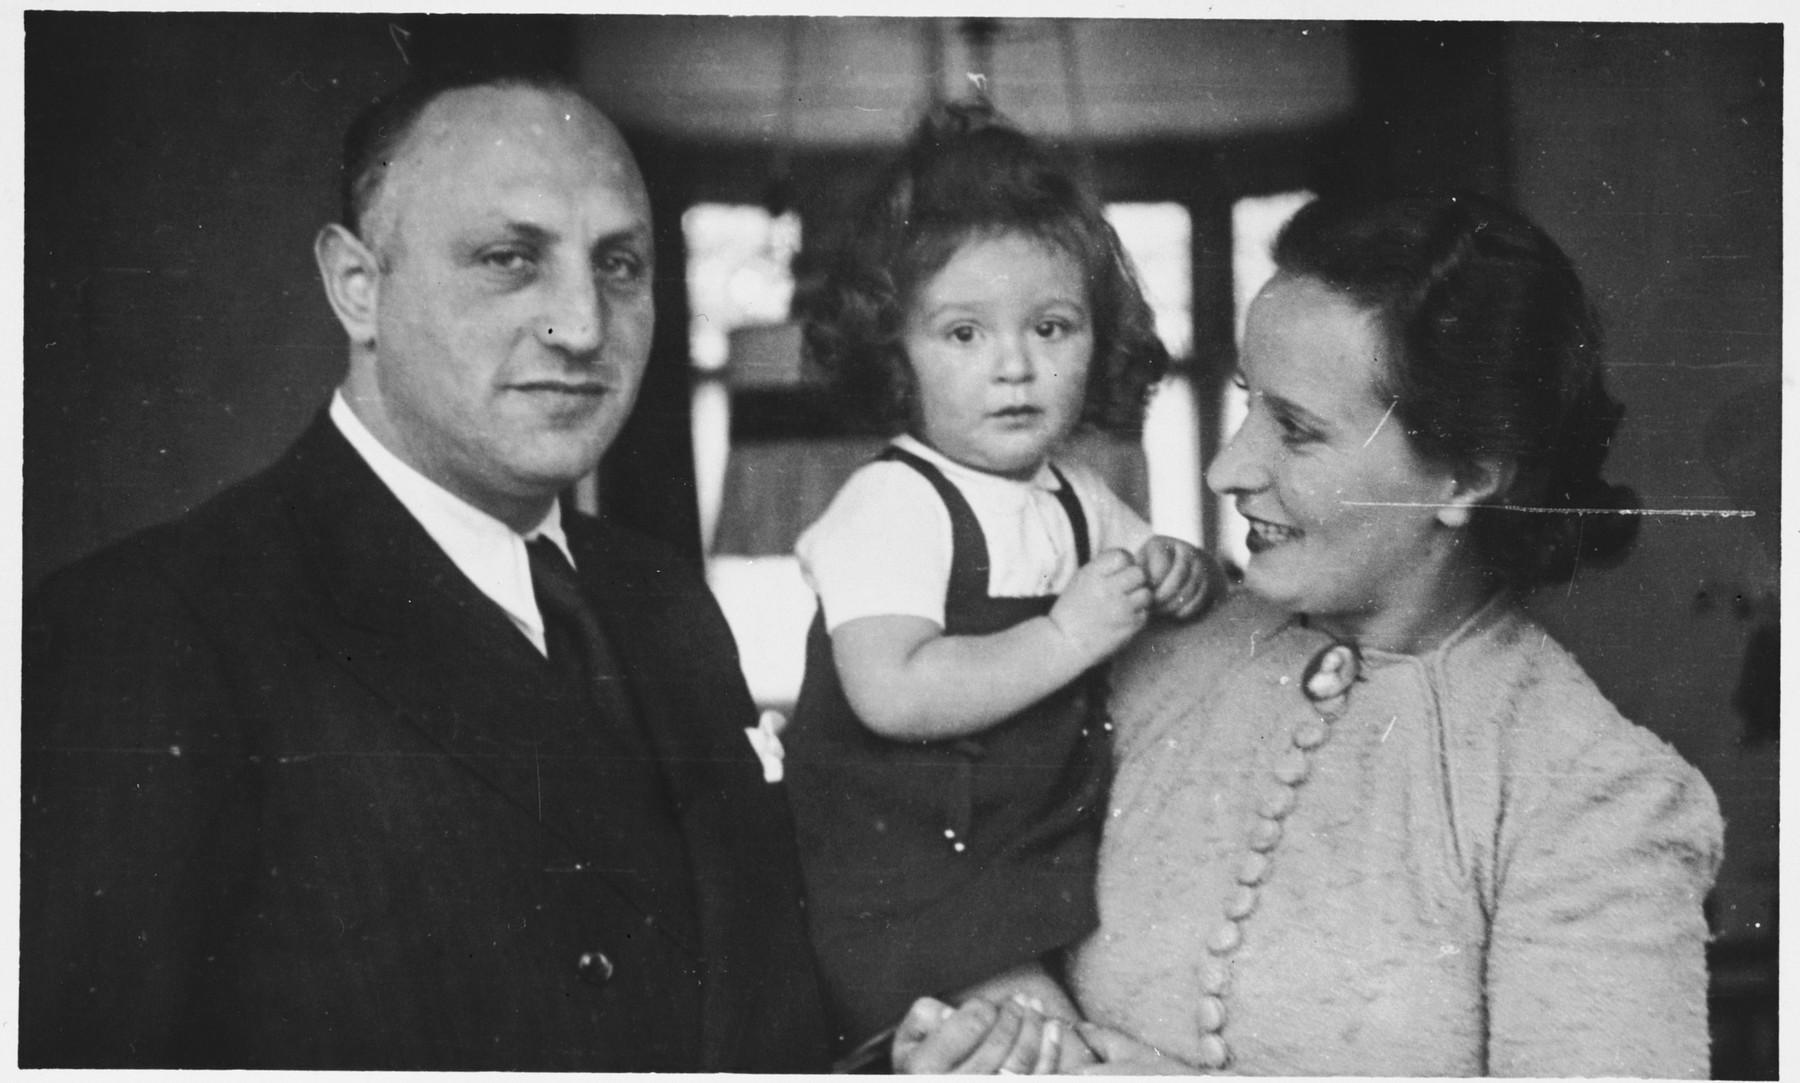 Rosemarie Schink Ensel poses with her daughter Julia and Judah Ensel.